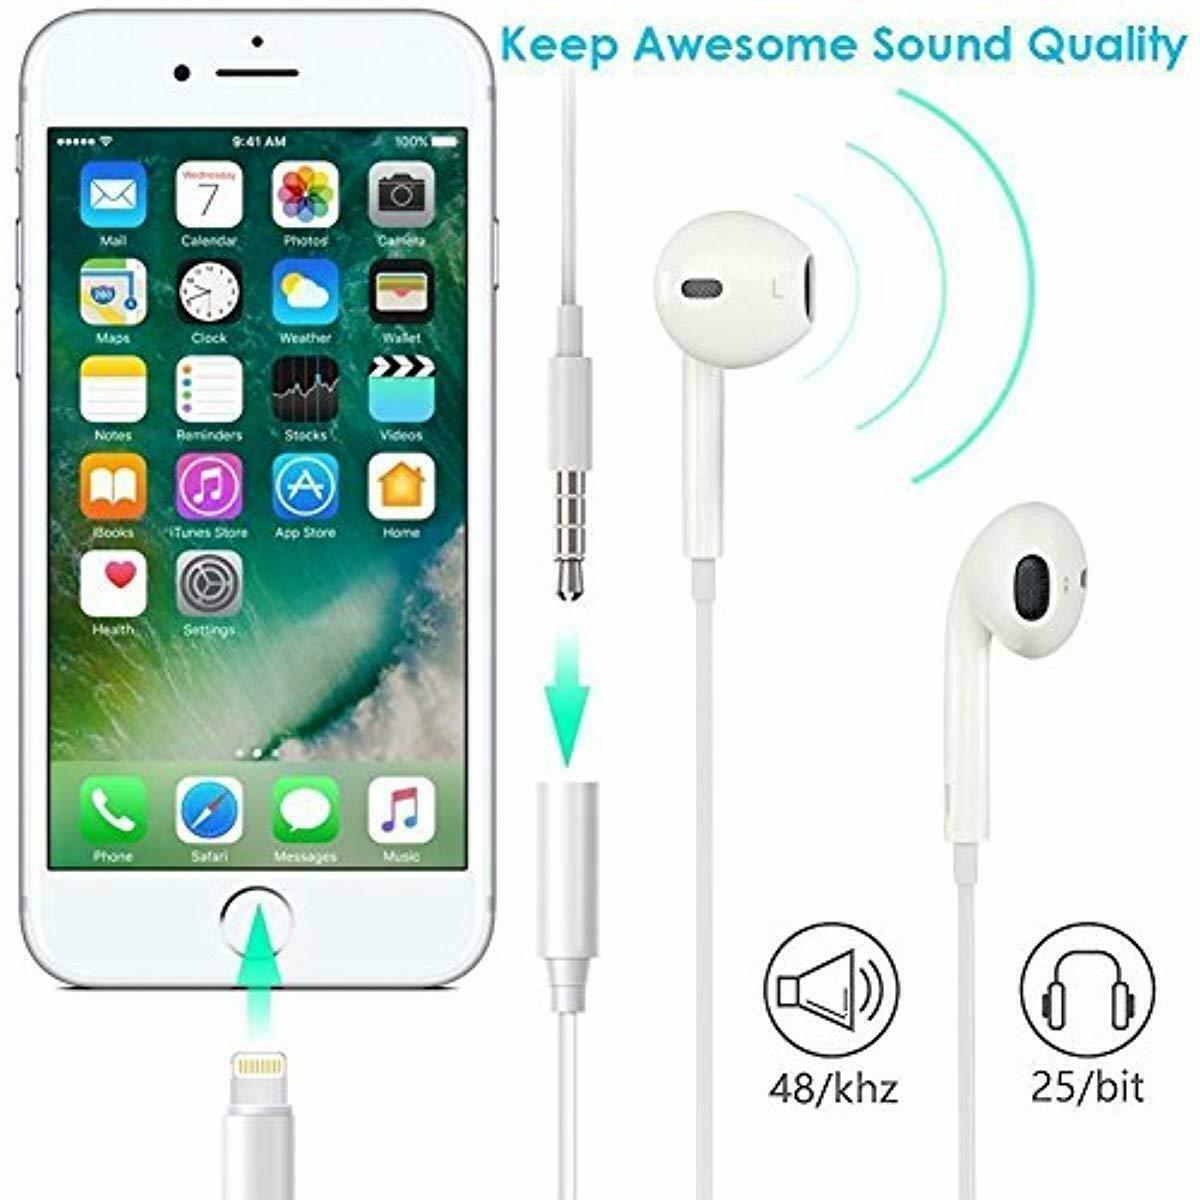 Earbuds Jack Adapter Cellphone Cable Earphones Lighting to 3.5mm Headphones New